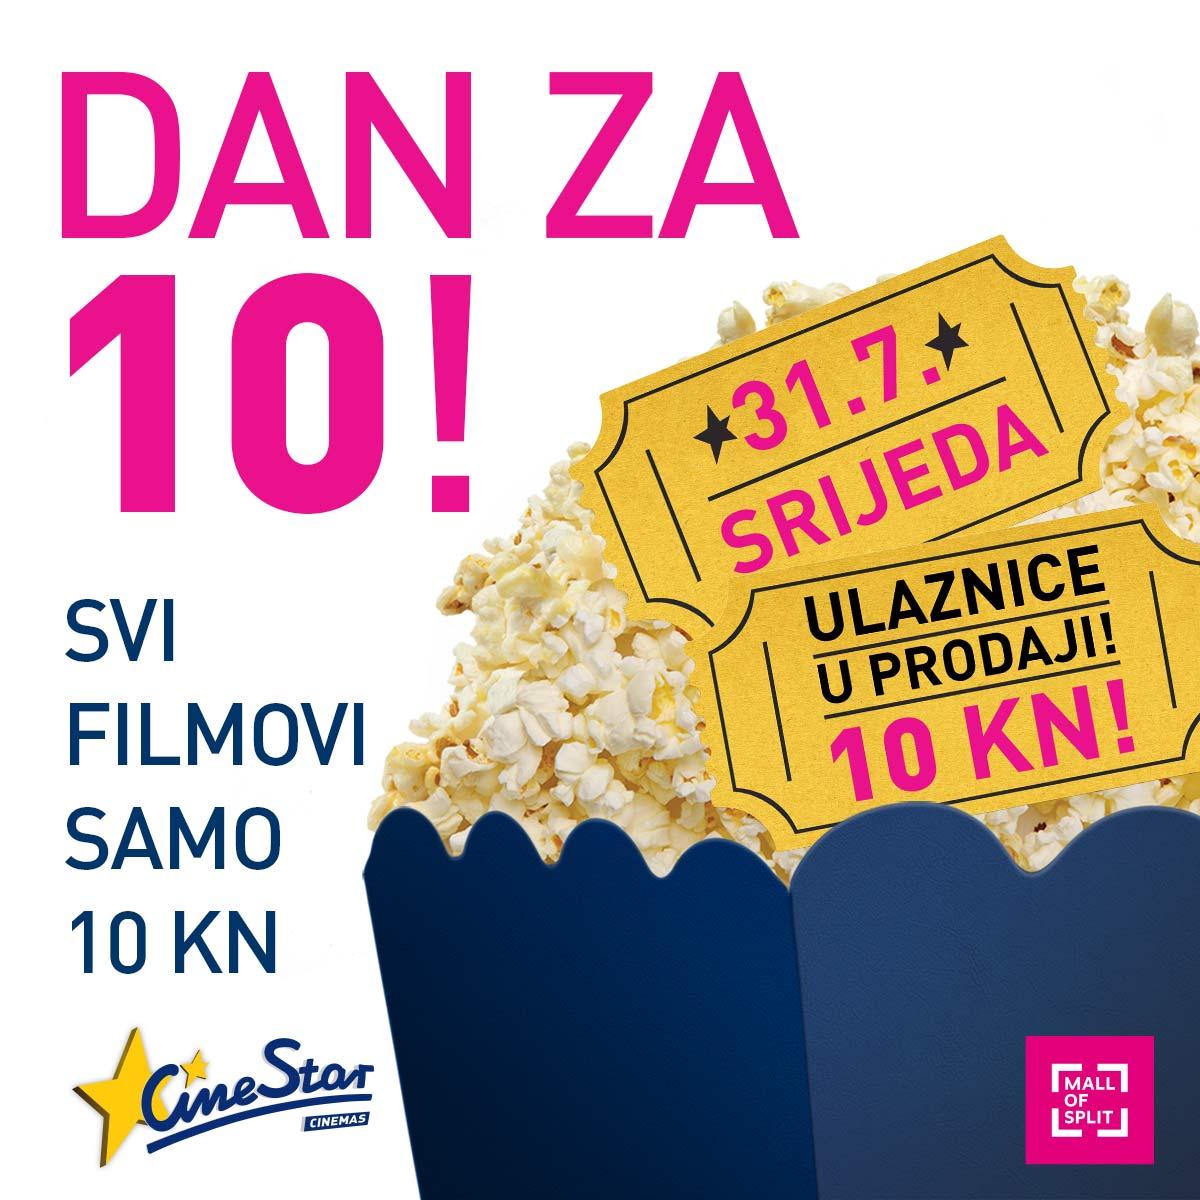 1200x1200_dan_za_10_HR_MST_CS